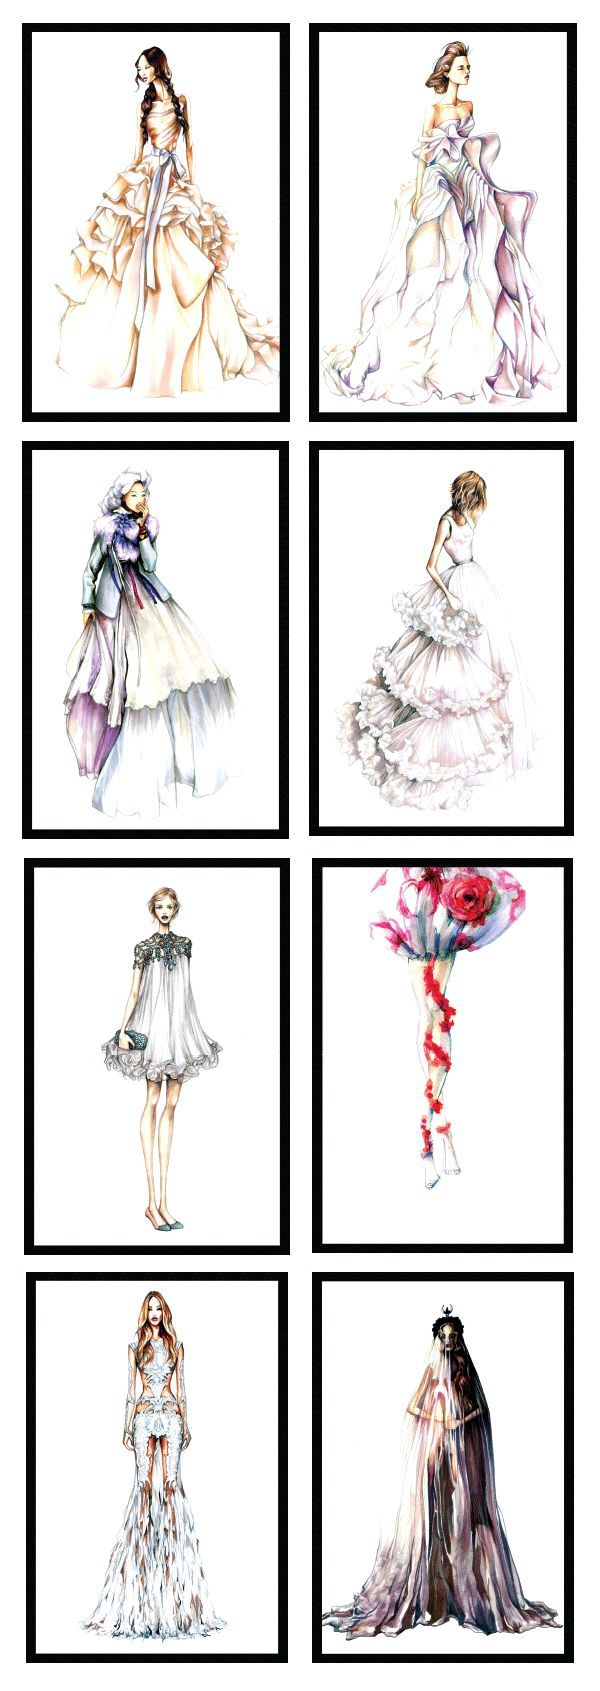 "<a href=""http://fashionfinishingschool.com/wp-content/uploads/2013/12/Wedding_Grid.png"" rel=""nofollow"" target=""_blank"">fashionfinishings...</a>"